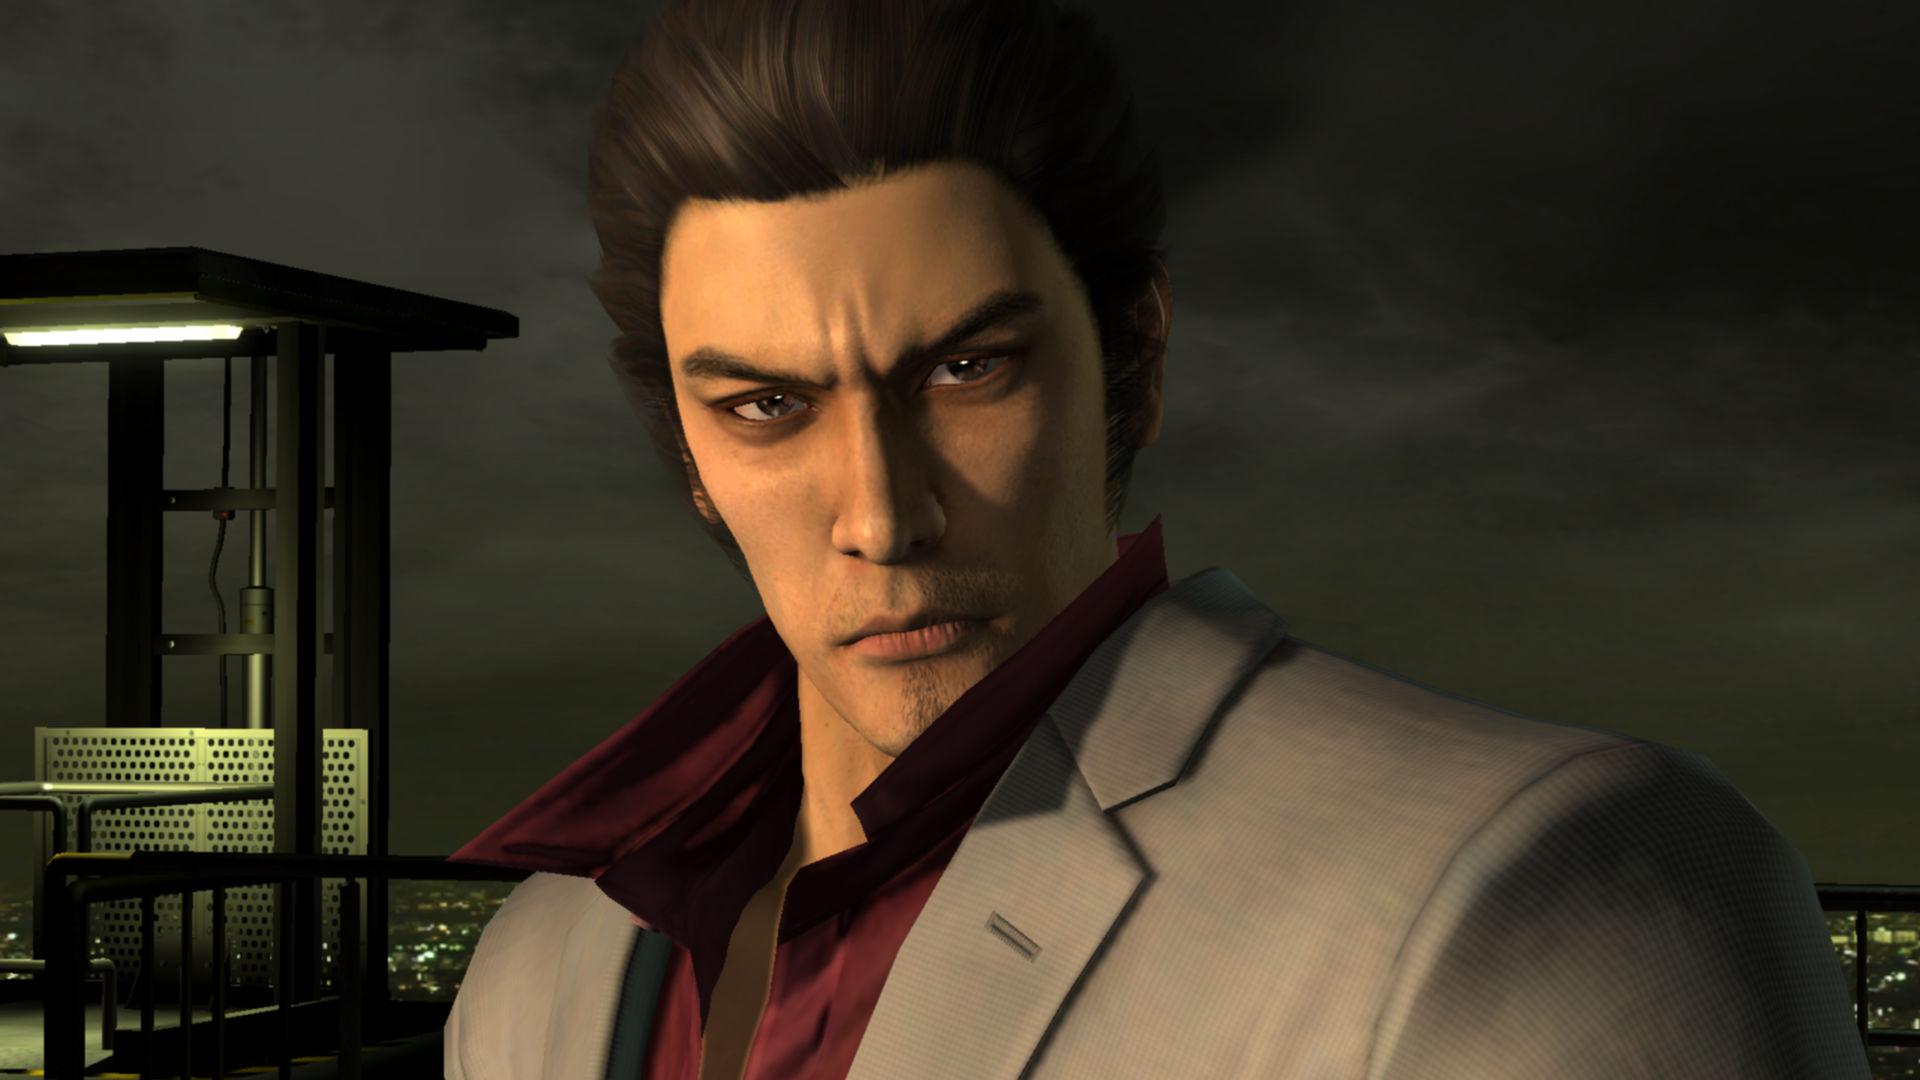 Yakuza 3, 4 & 5 remasters coming to PS4 » SEGAbits - #1